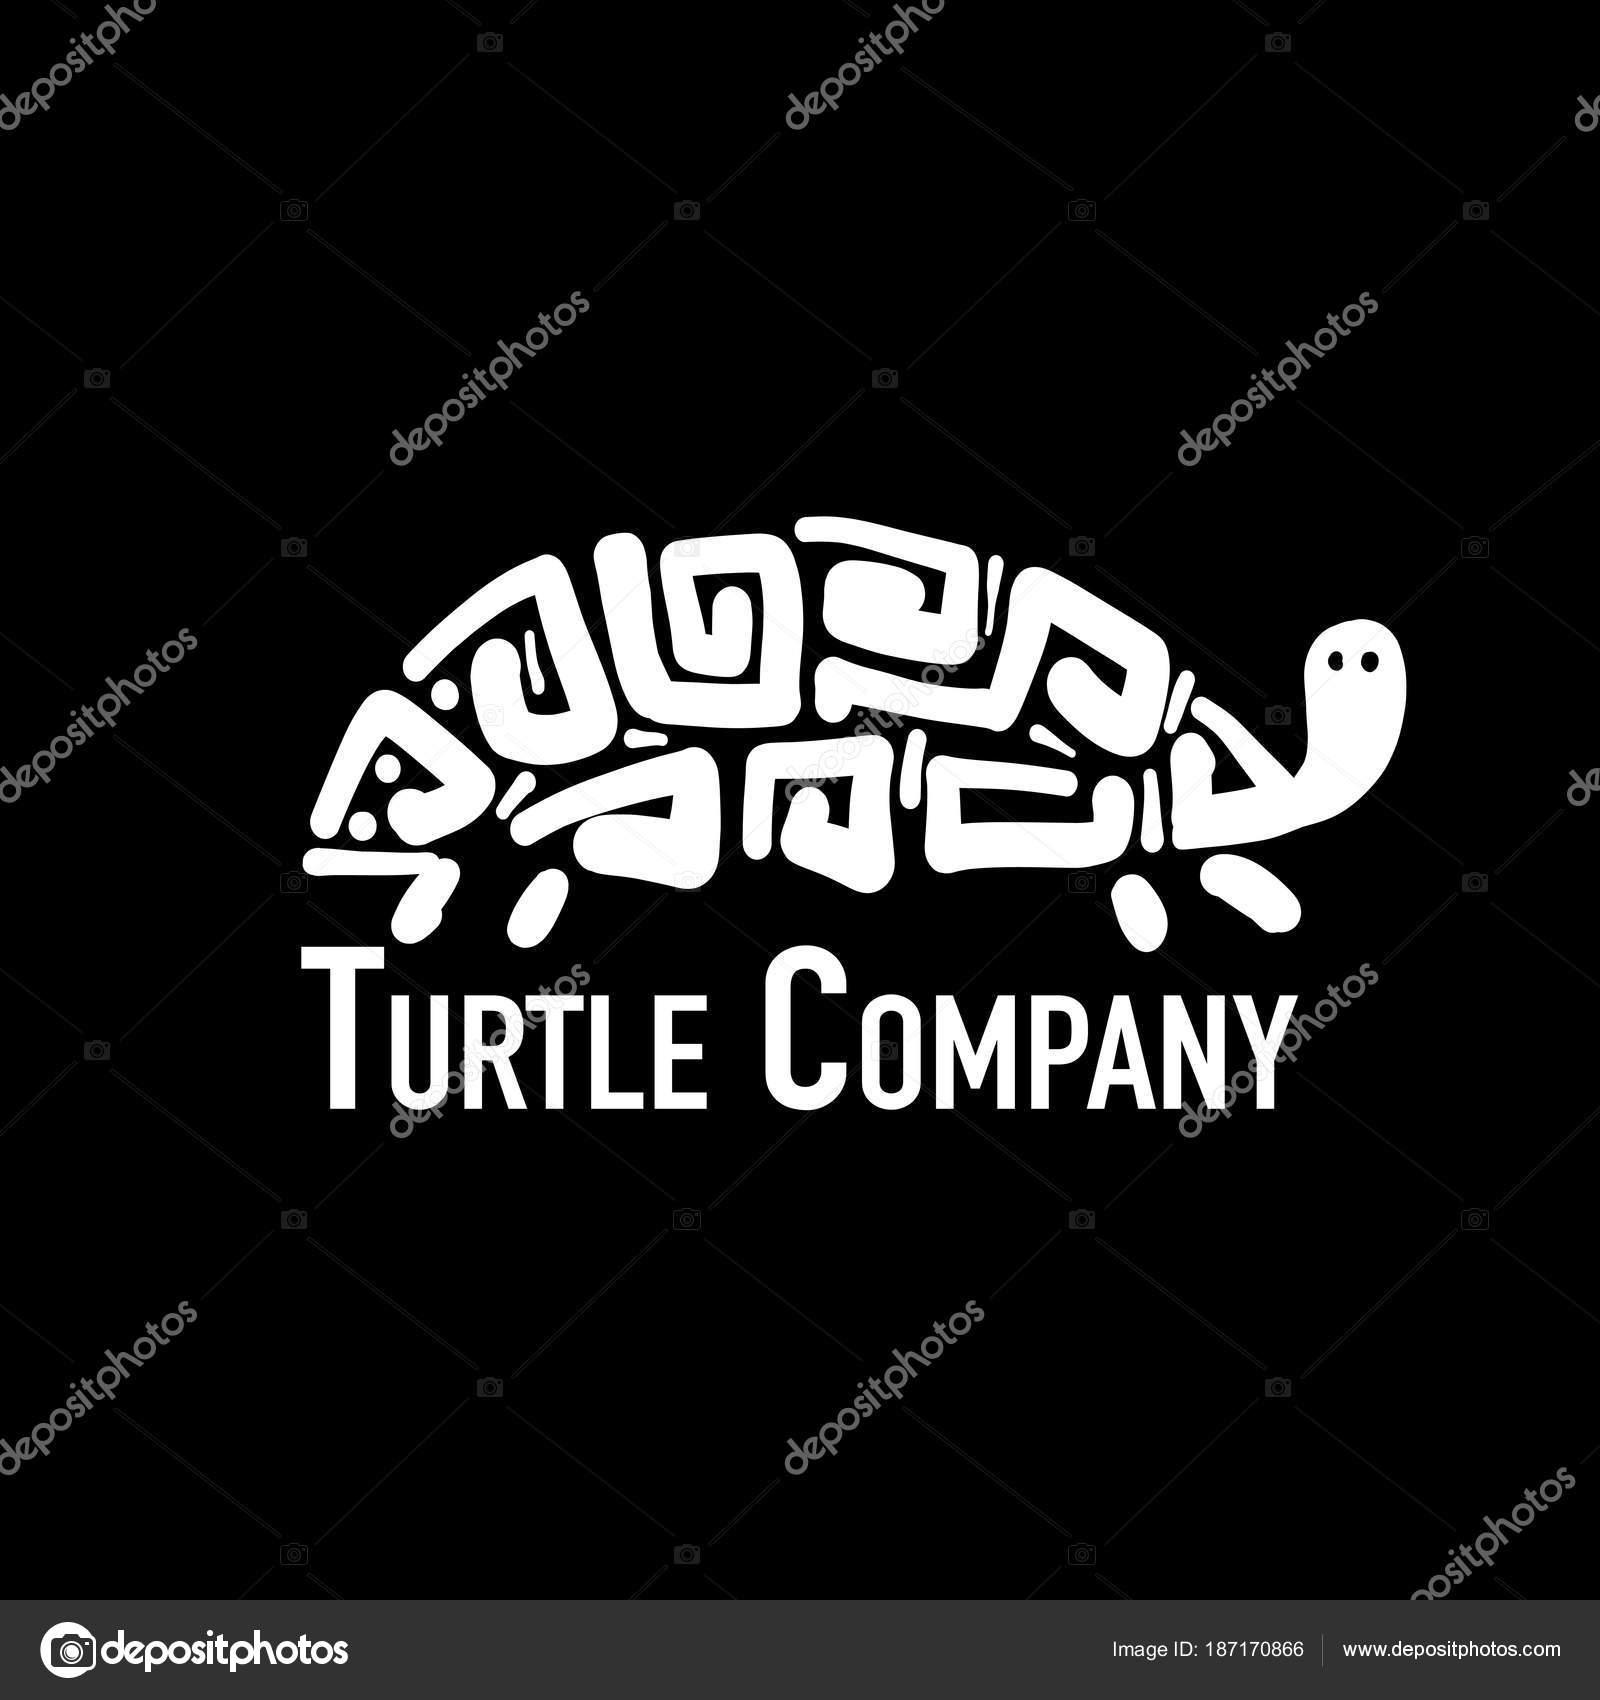 Silueta De Tortuga Para Imprimir Tortuga Del Logo Silueta Para Su